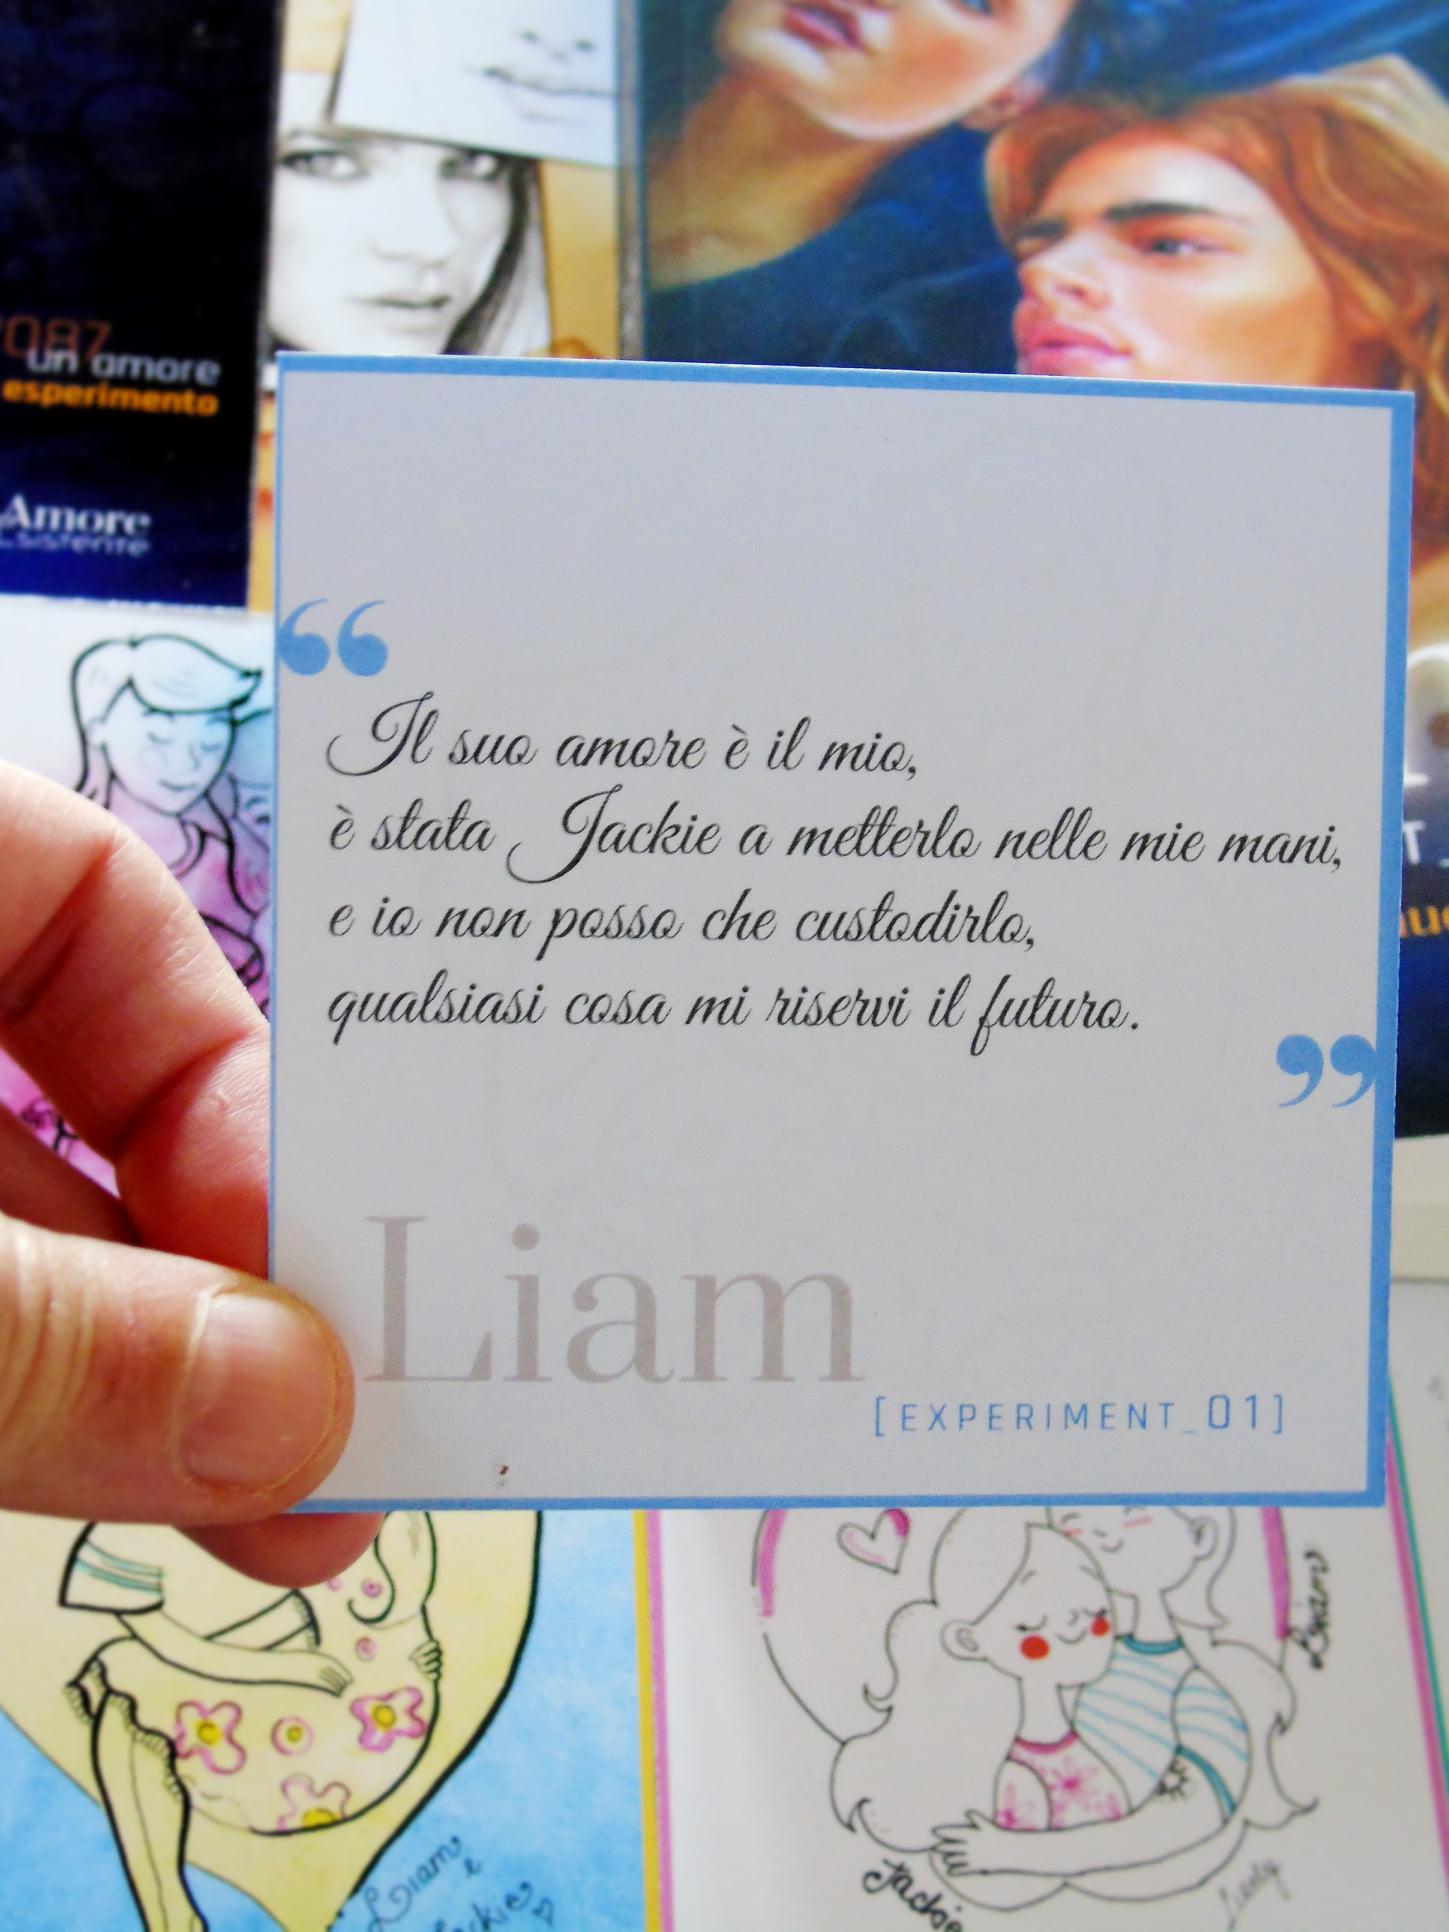 Liam experiment 01 - card